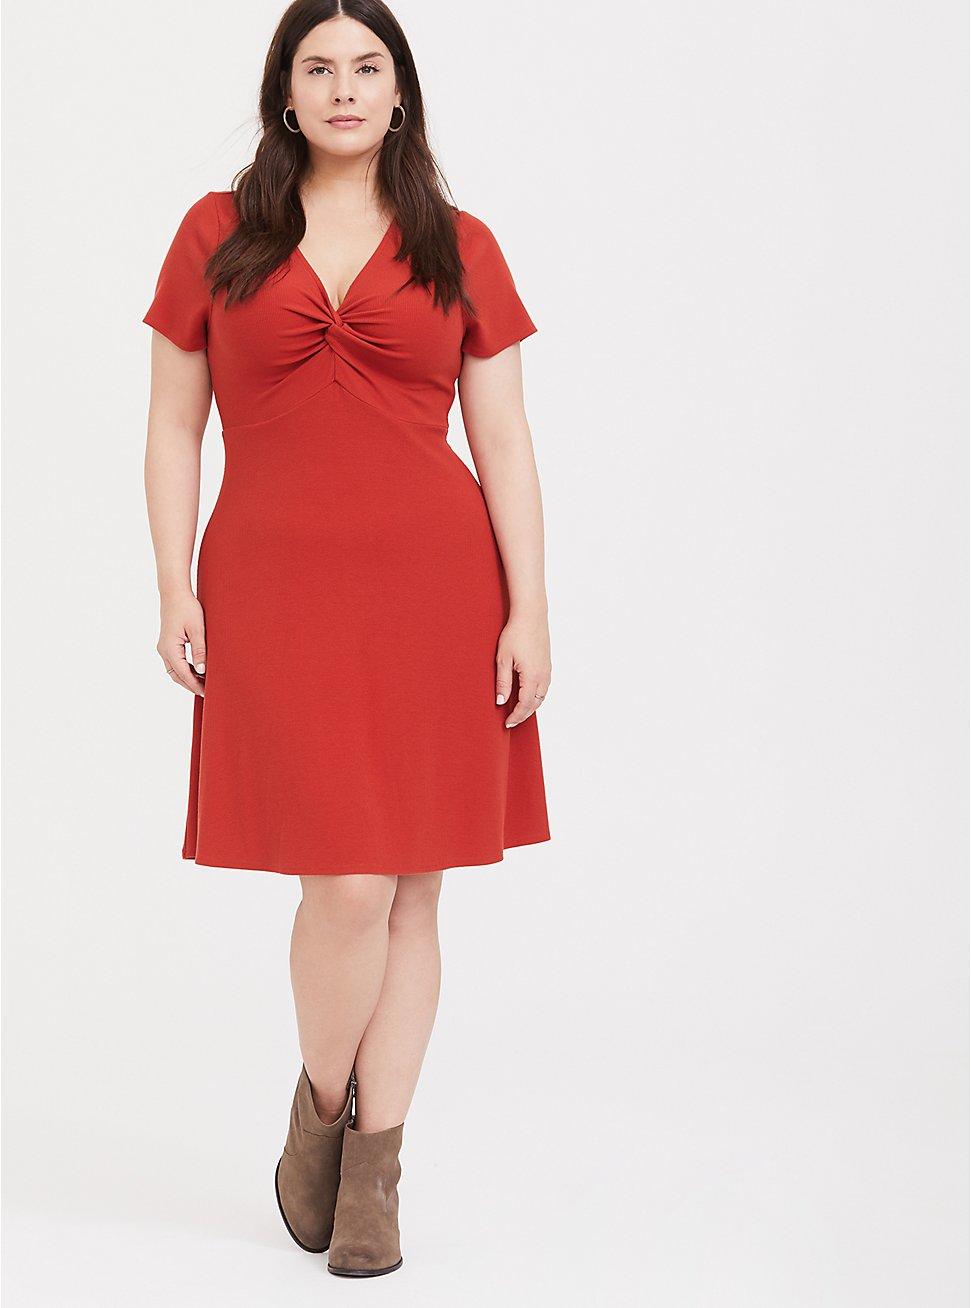 Red Terracotta Ribbed Twist Front Skater Dress, KETCHUP, hi-res